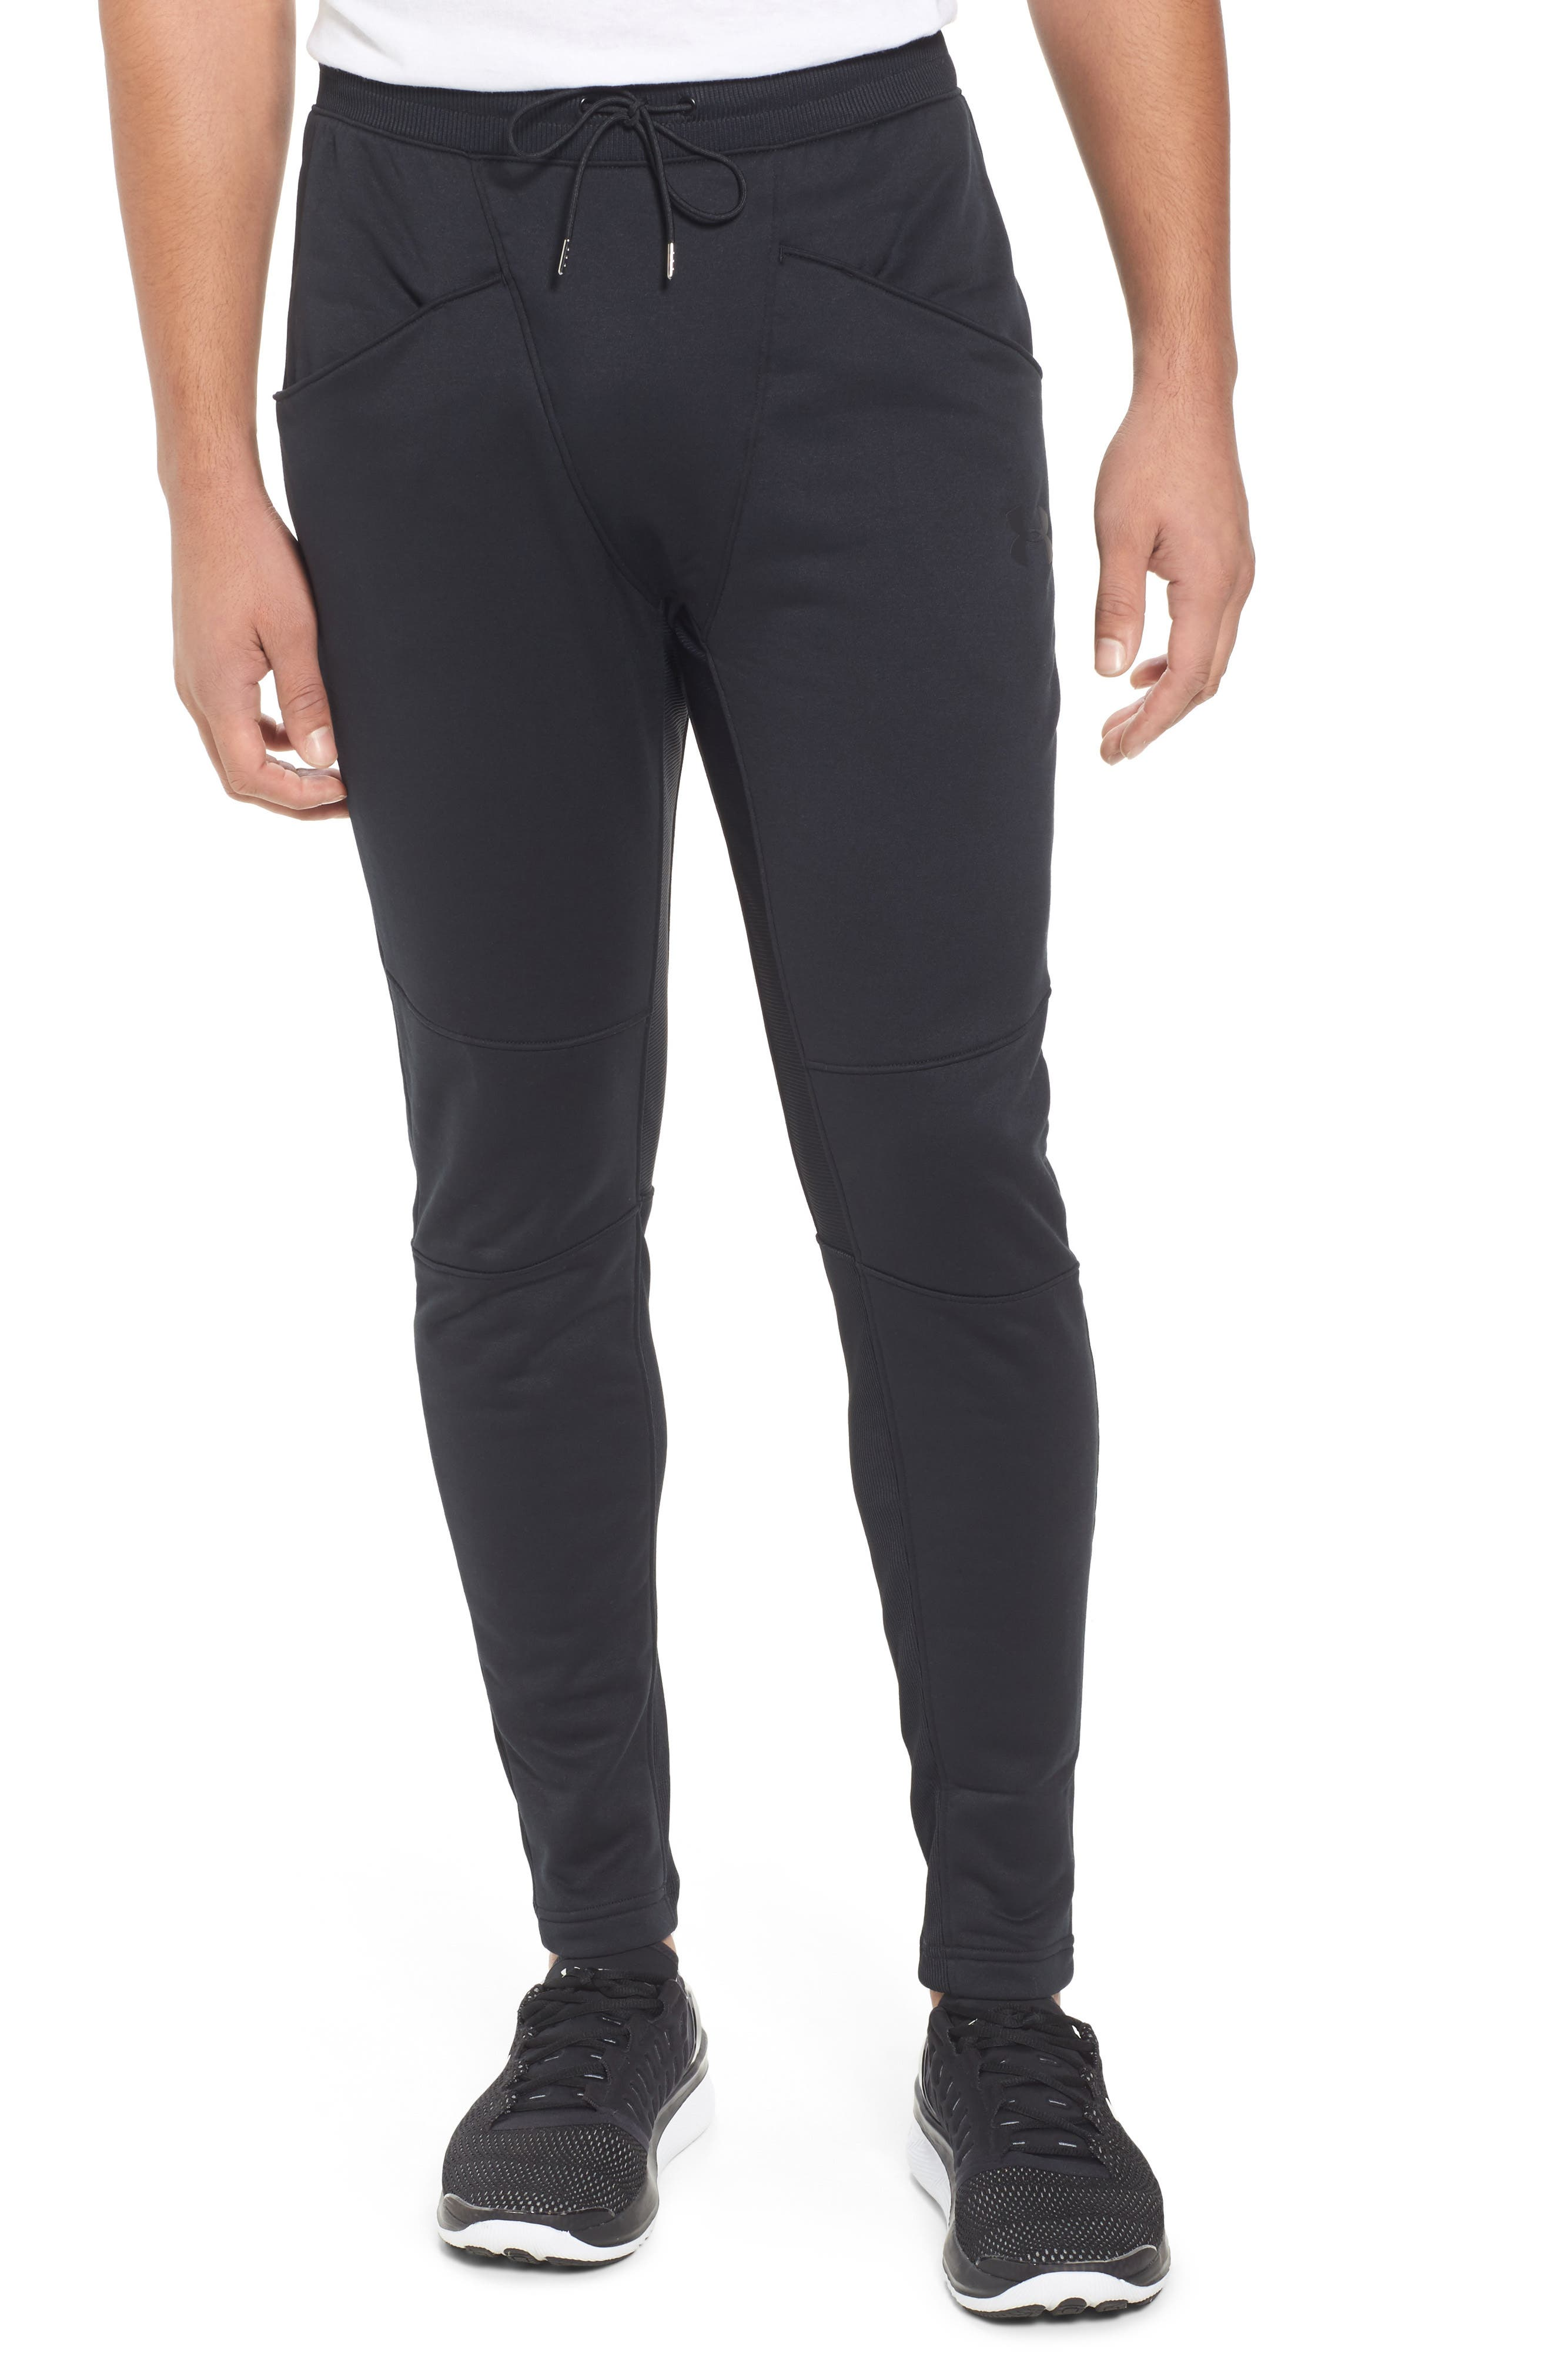 Courtside Training Pants,                         Main,                         color, Black / Black / Black